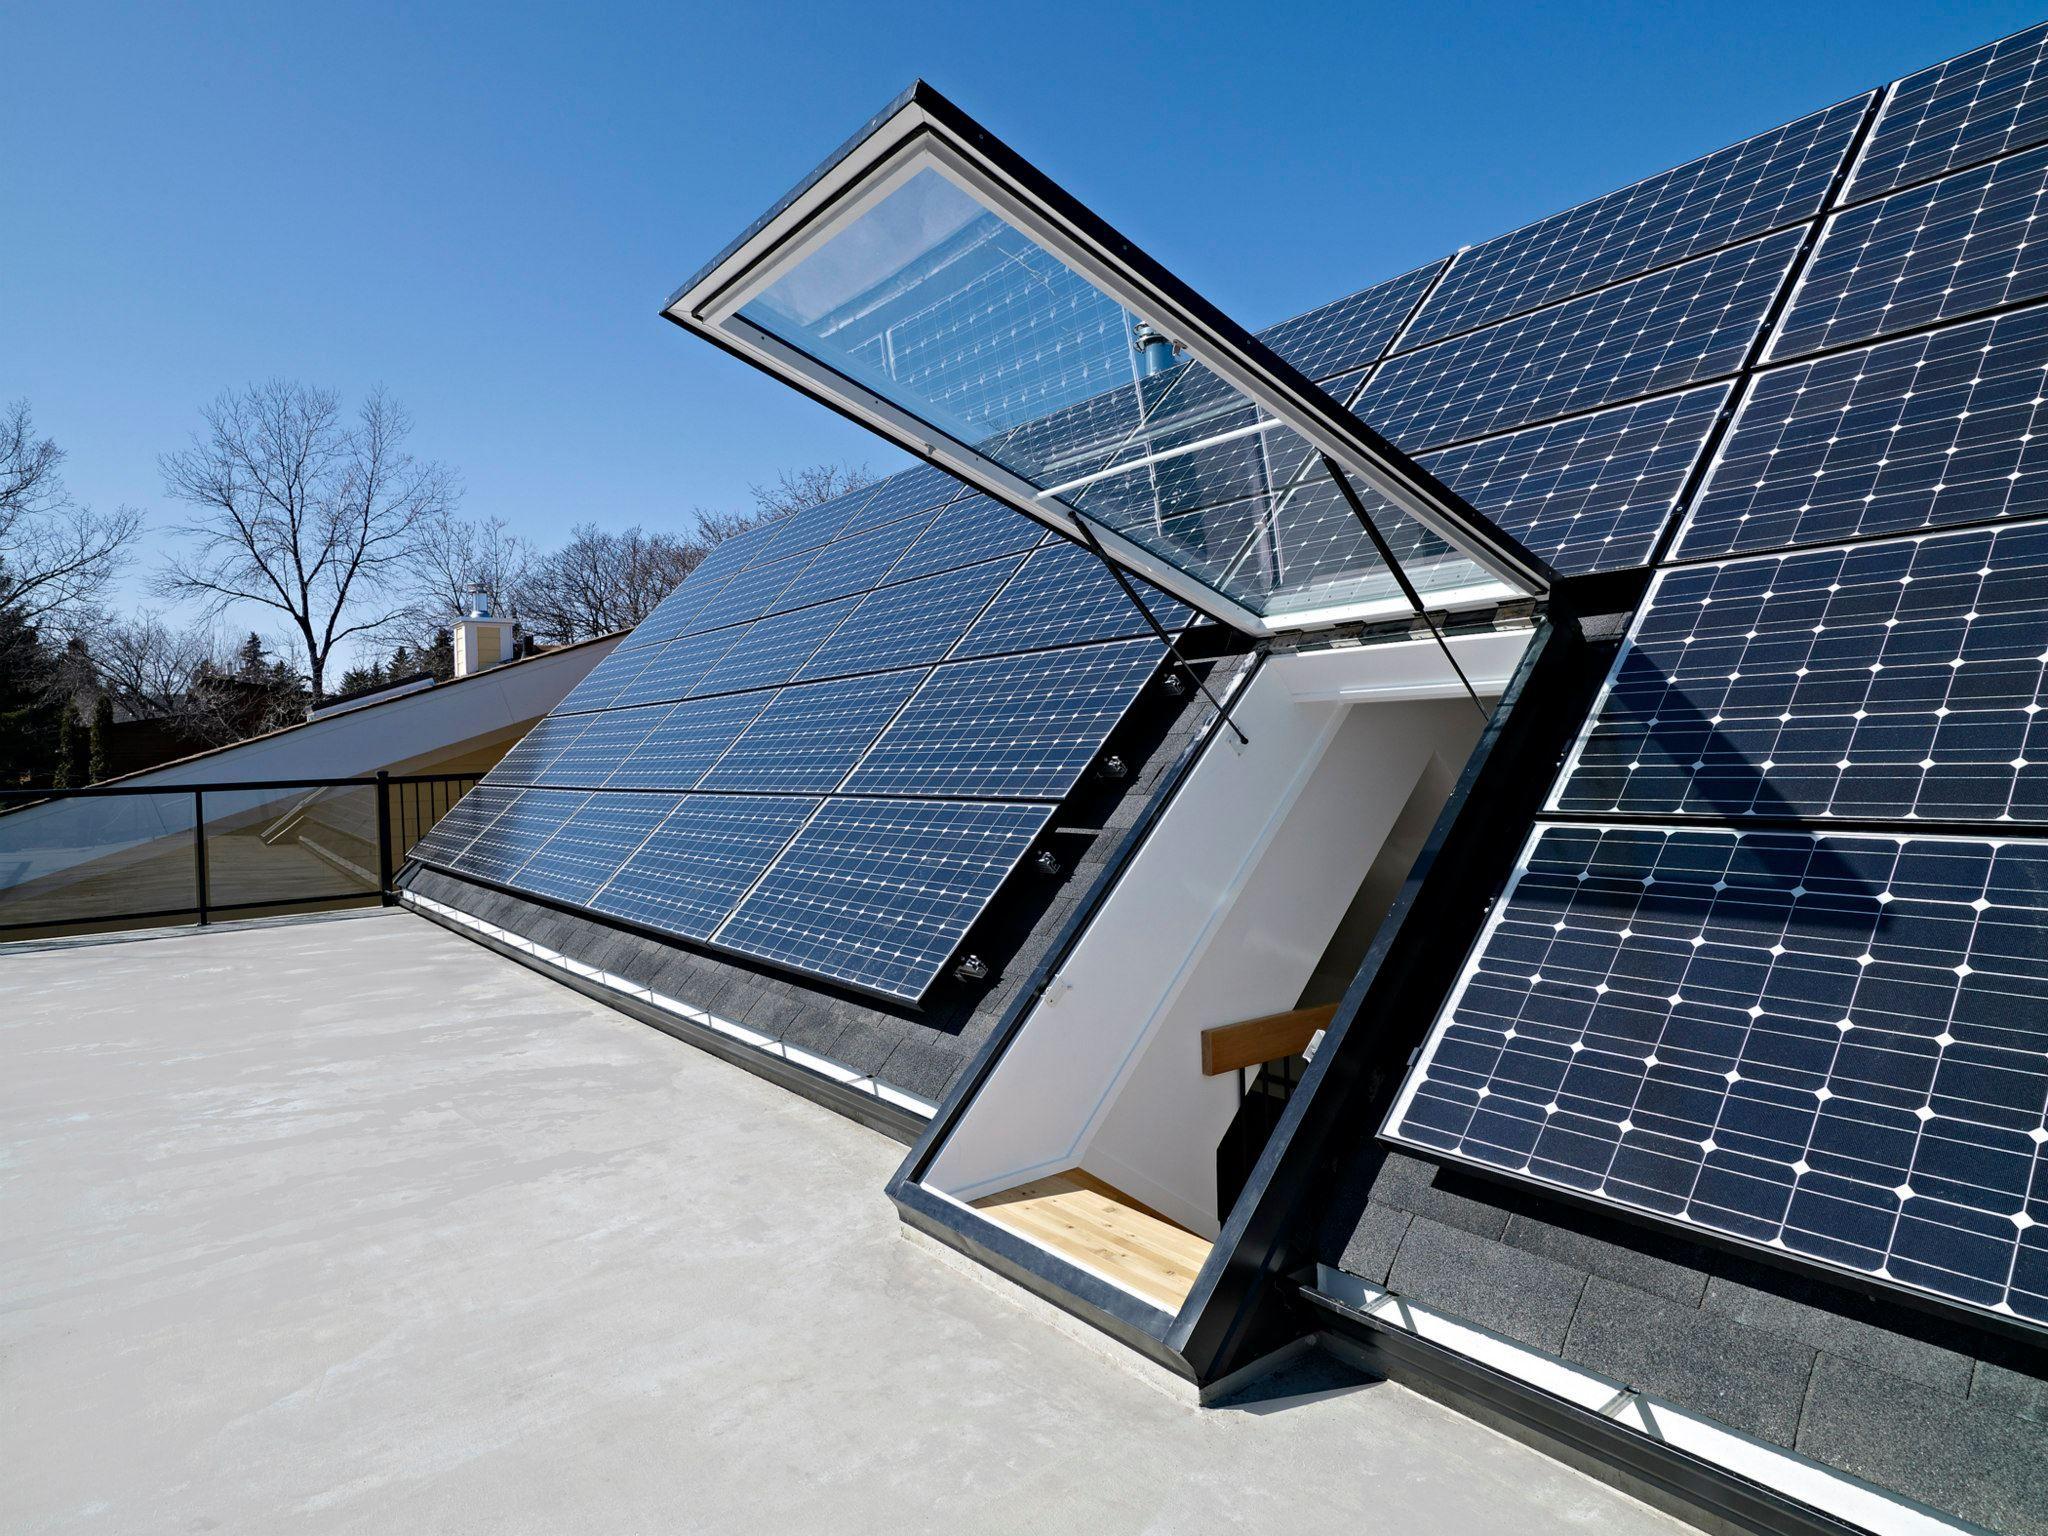 Roof Doors Glass Roof Doors Solar Panels Contemporary Farmhouse Best Solar Panels